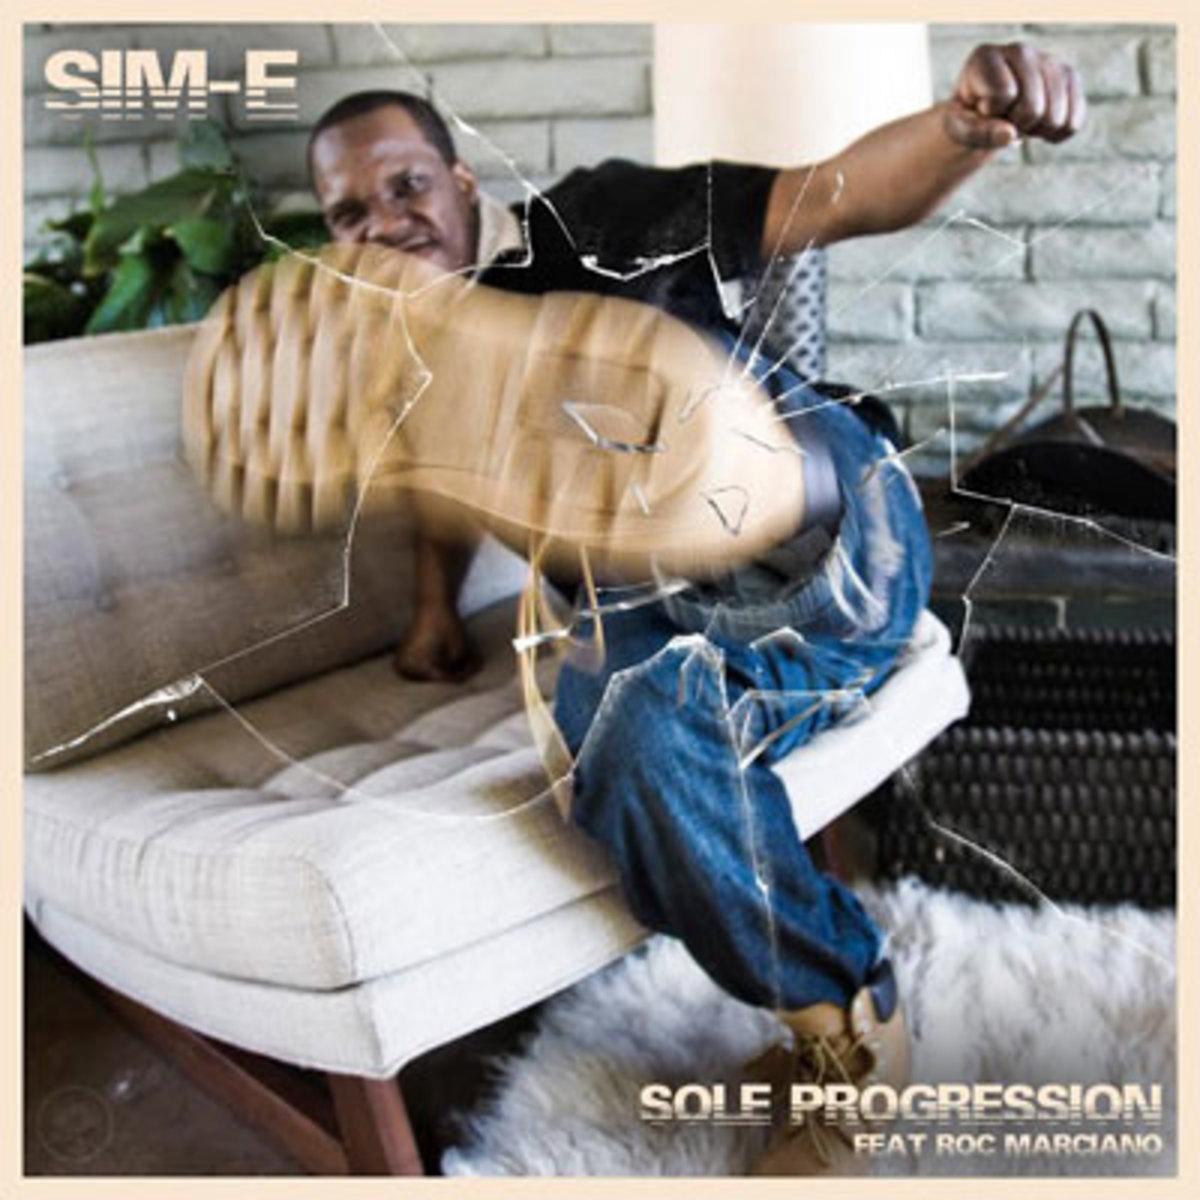 sime-soleprogression.jpg